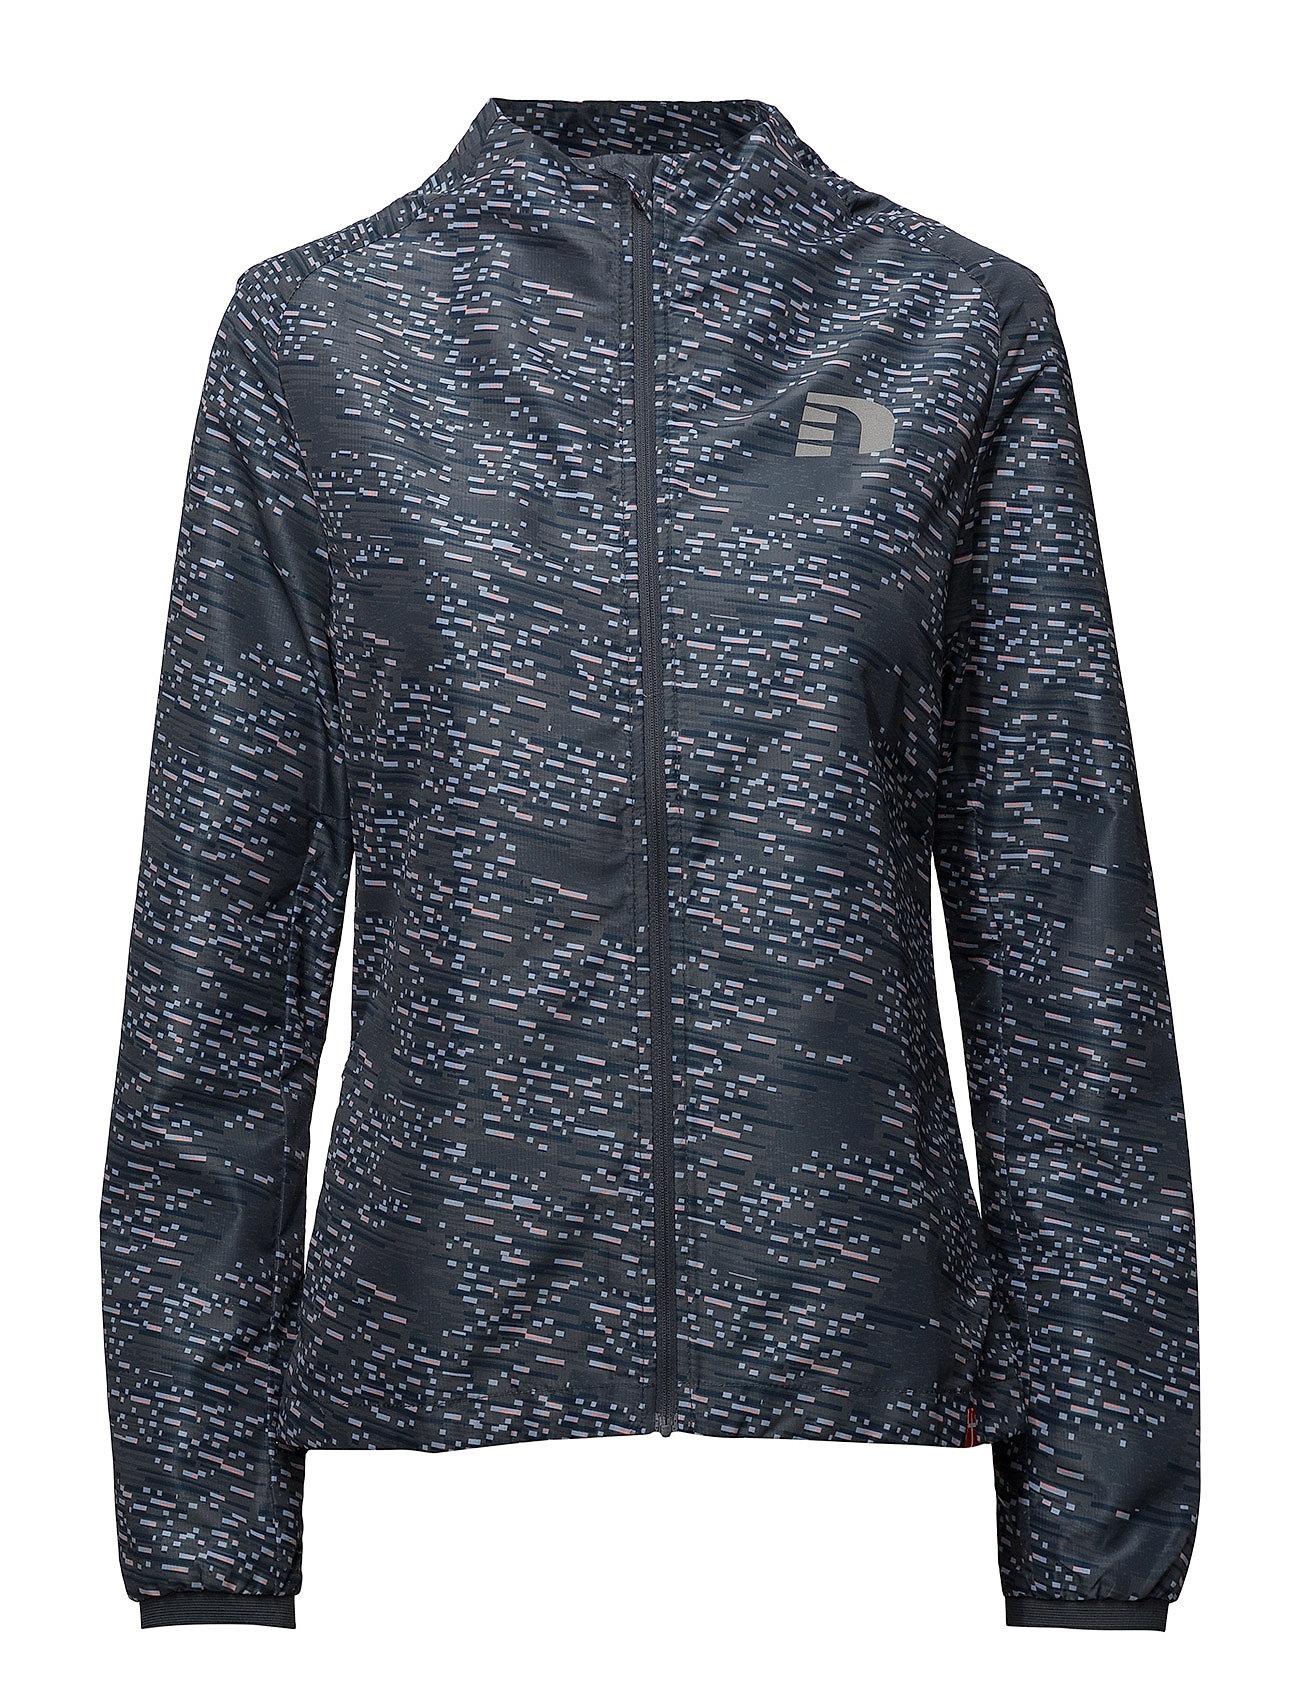 Newline Imotion Printed Jacket